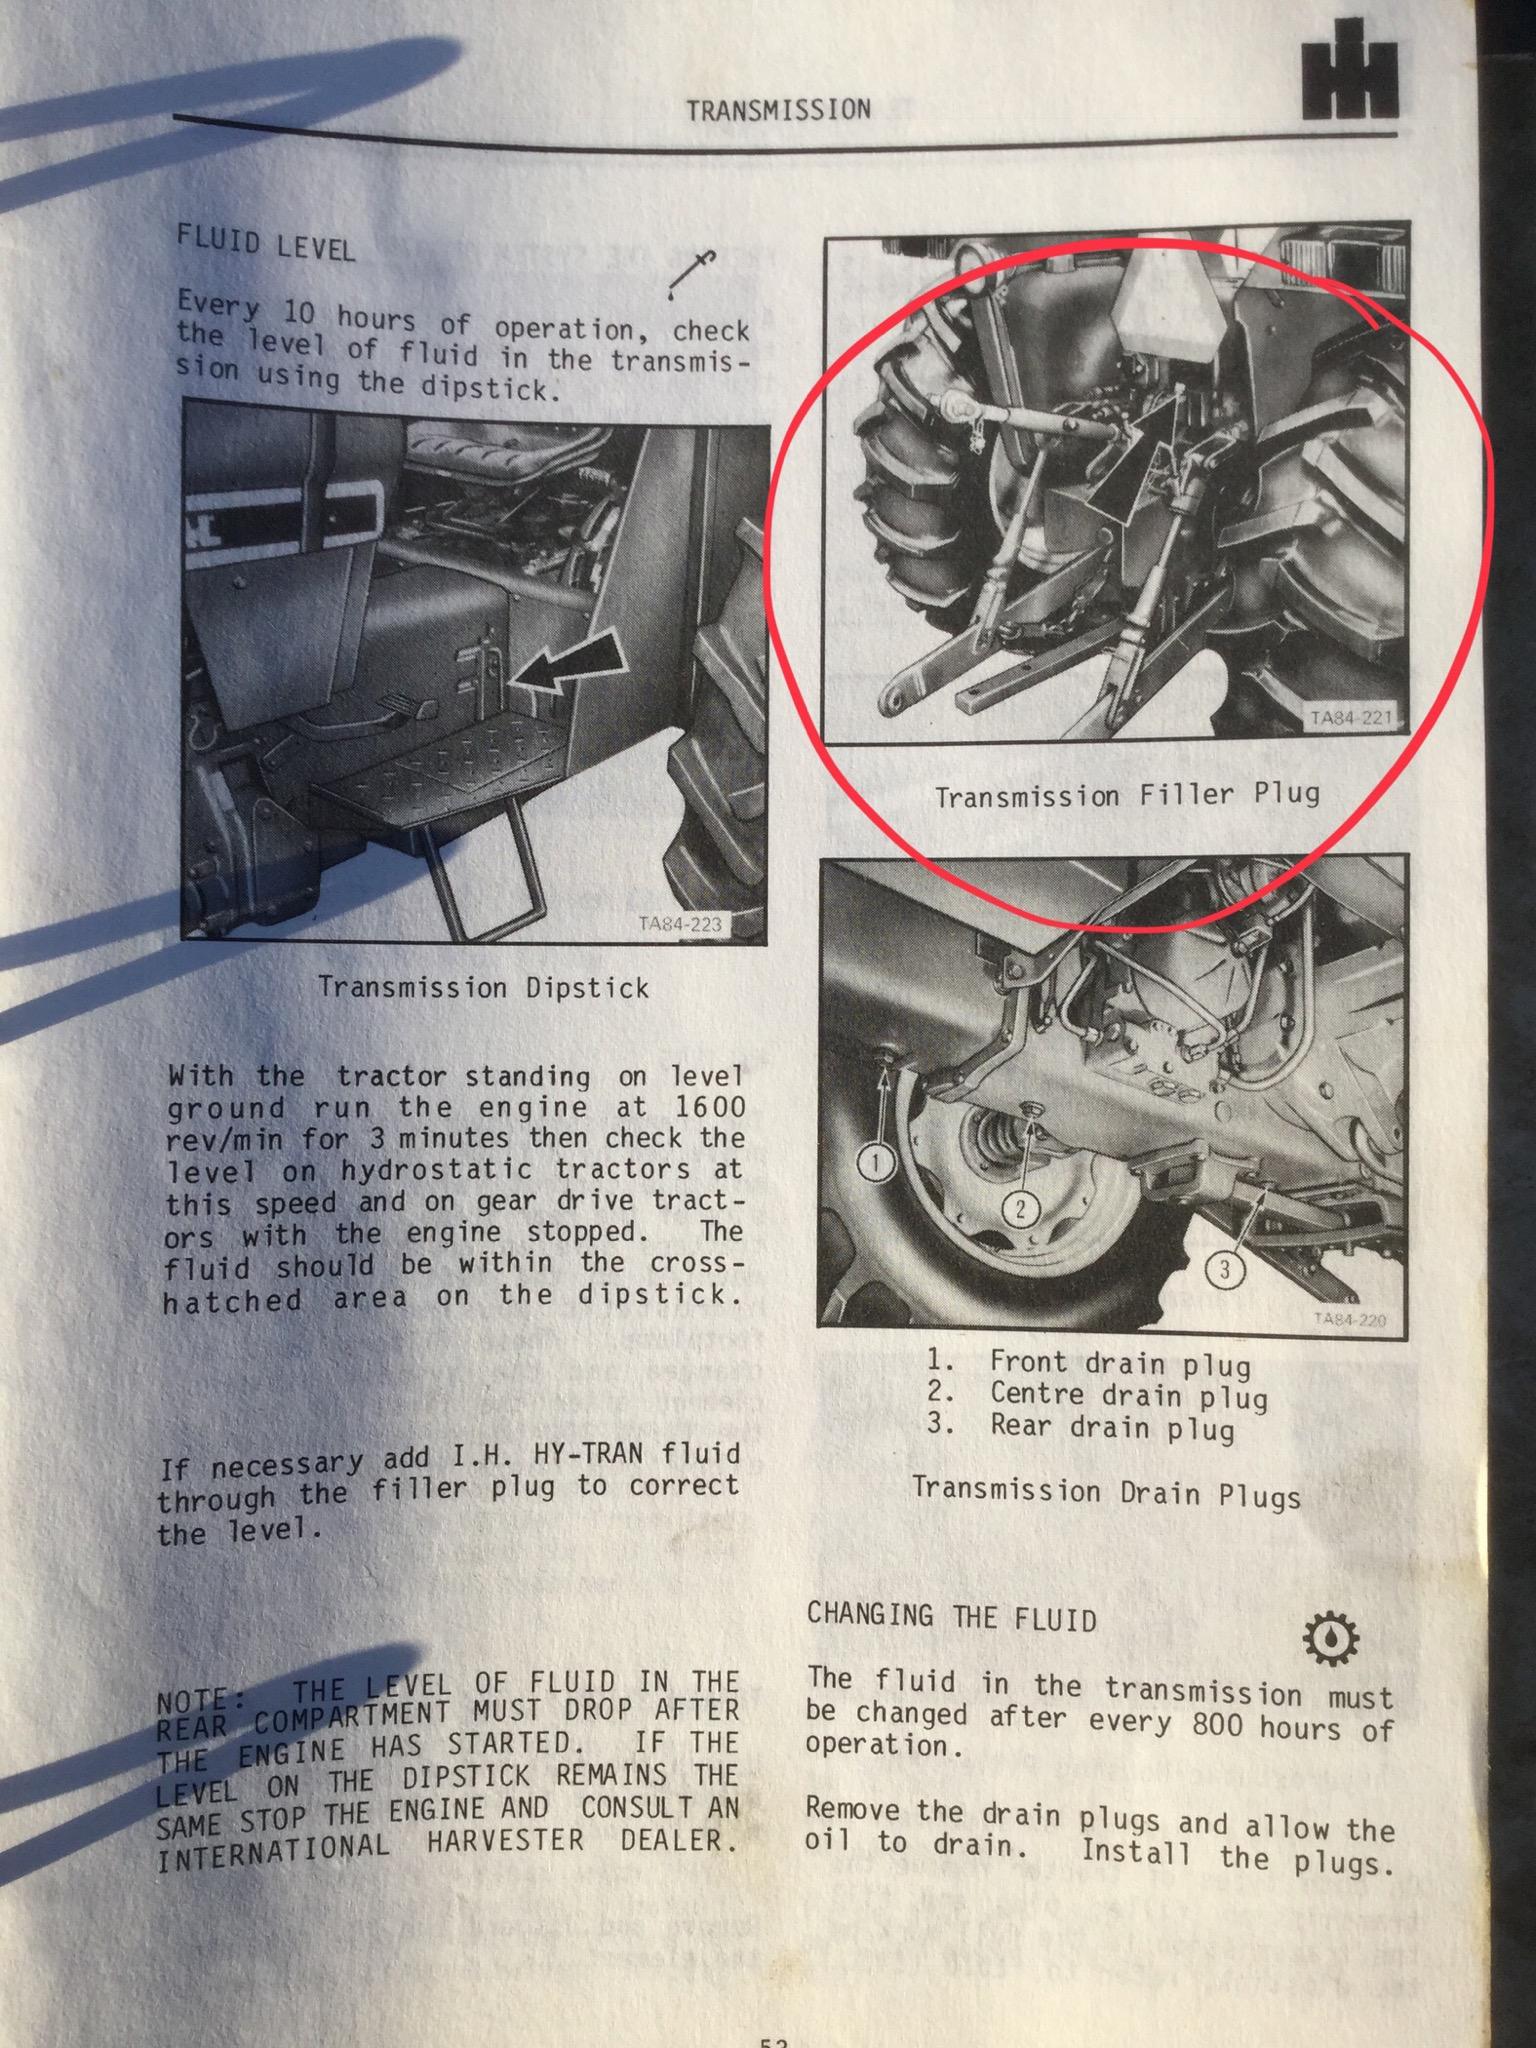 Inter 454 Drive Problem - General IH - Red Power Magazine